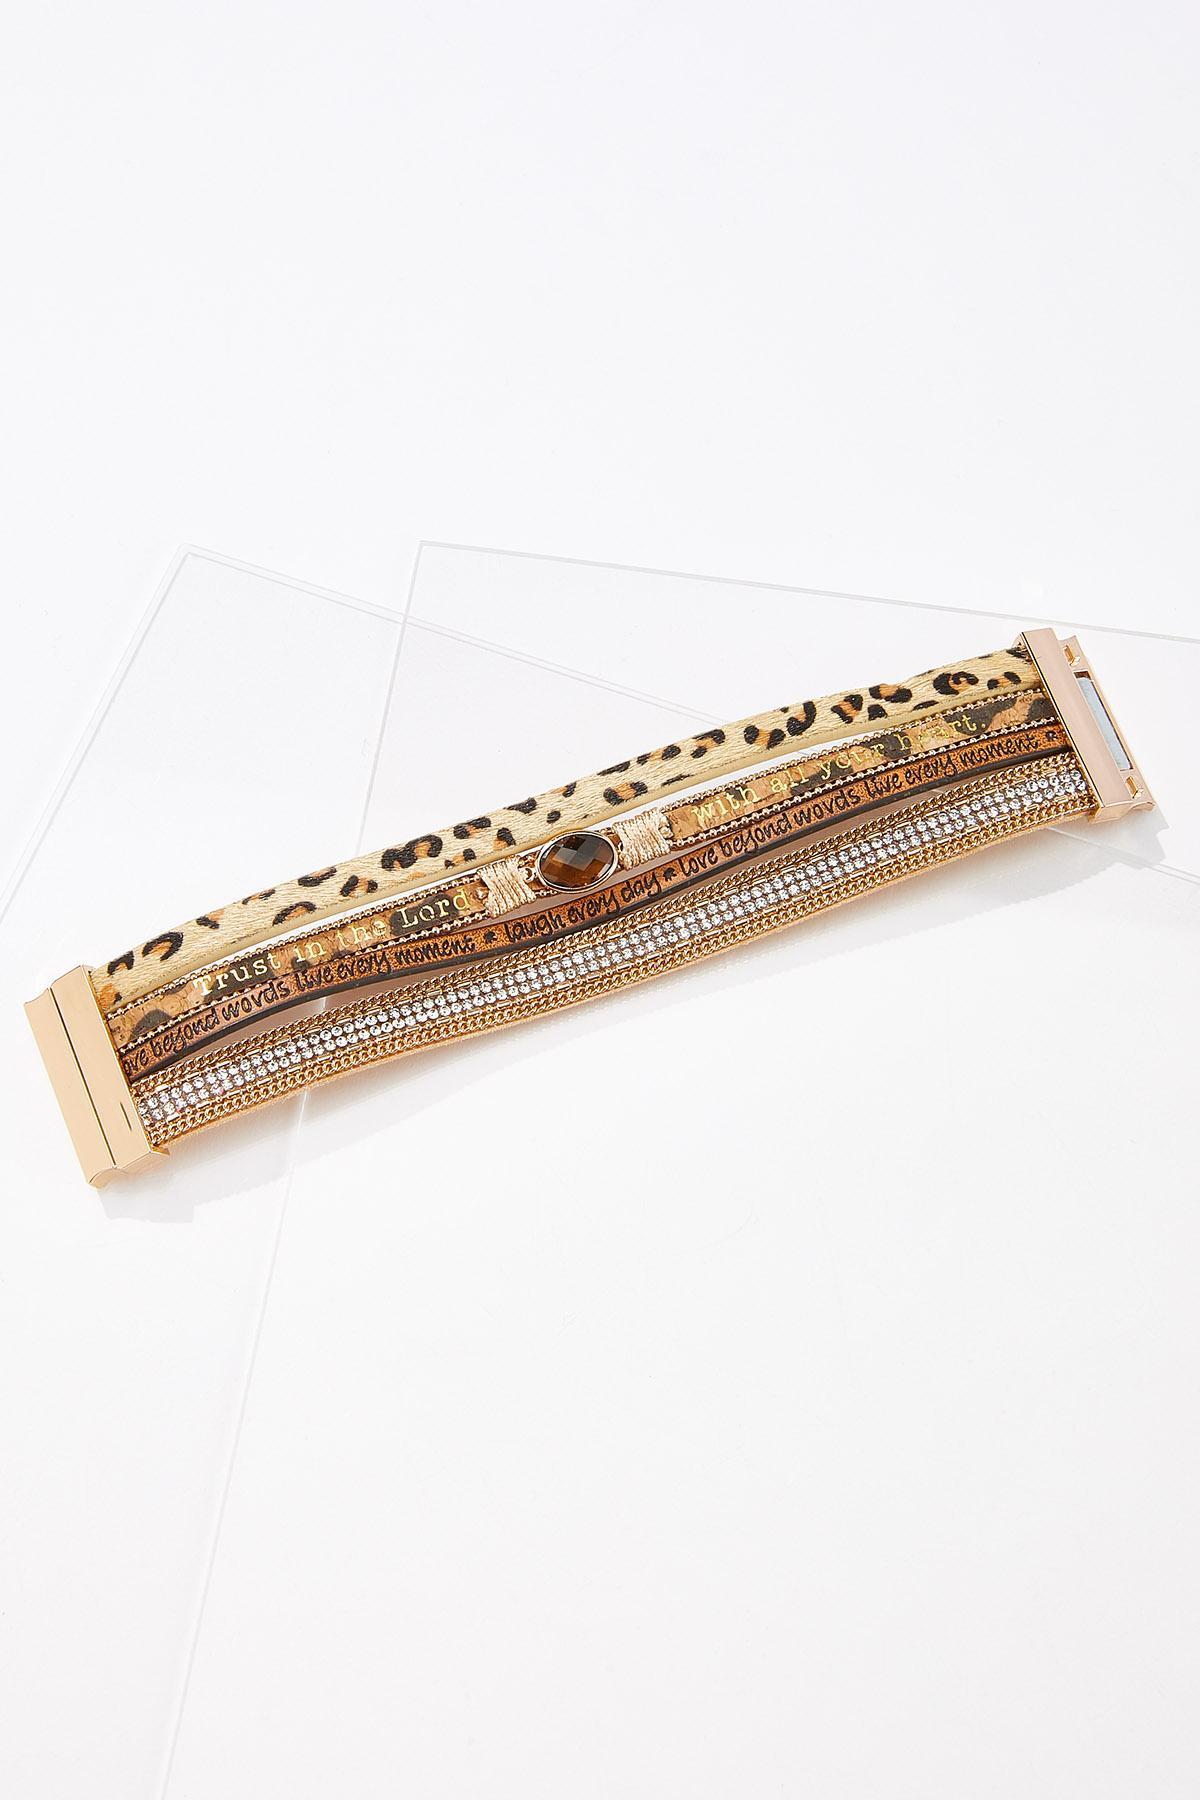 Inspirational Animal Print Cord Bracelet